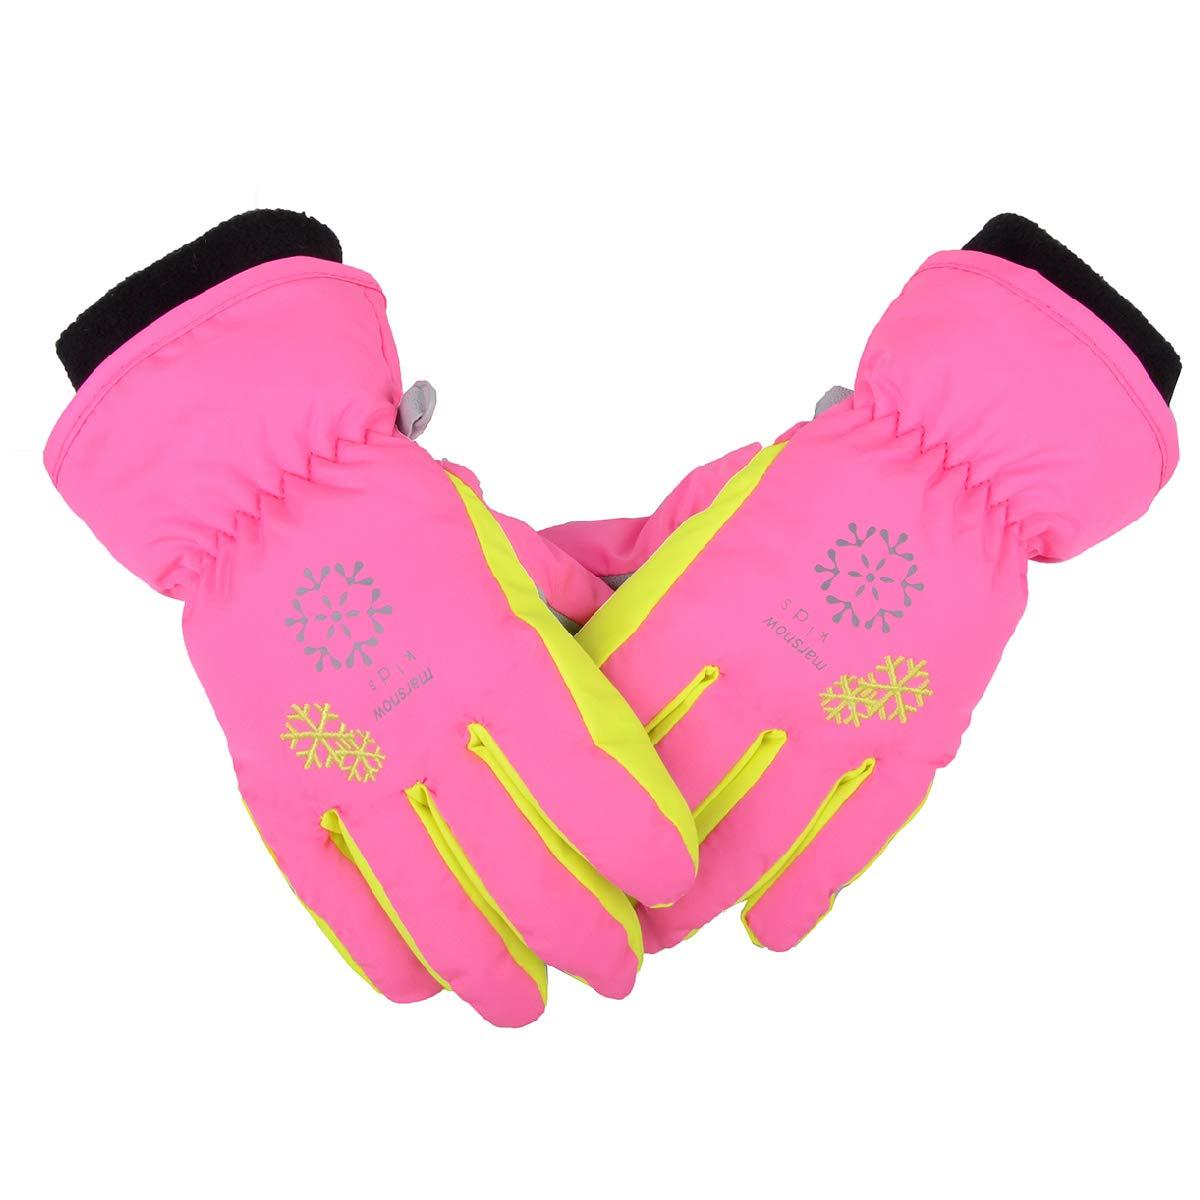 8991ee889 TRIWONDER Ski Snowboard Gloves for Kids - Waterproof Winter Warm Gloves  Thermal Fleece Snow Gloves product